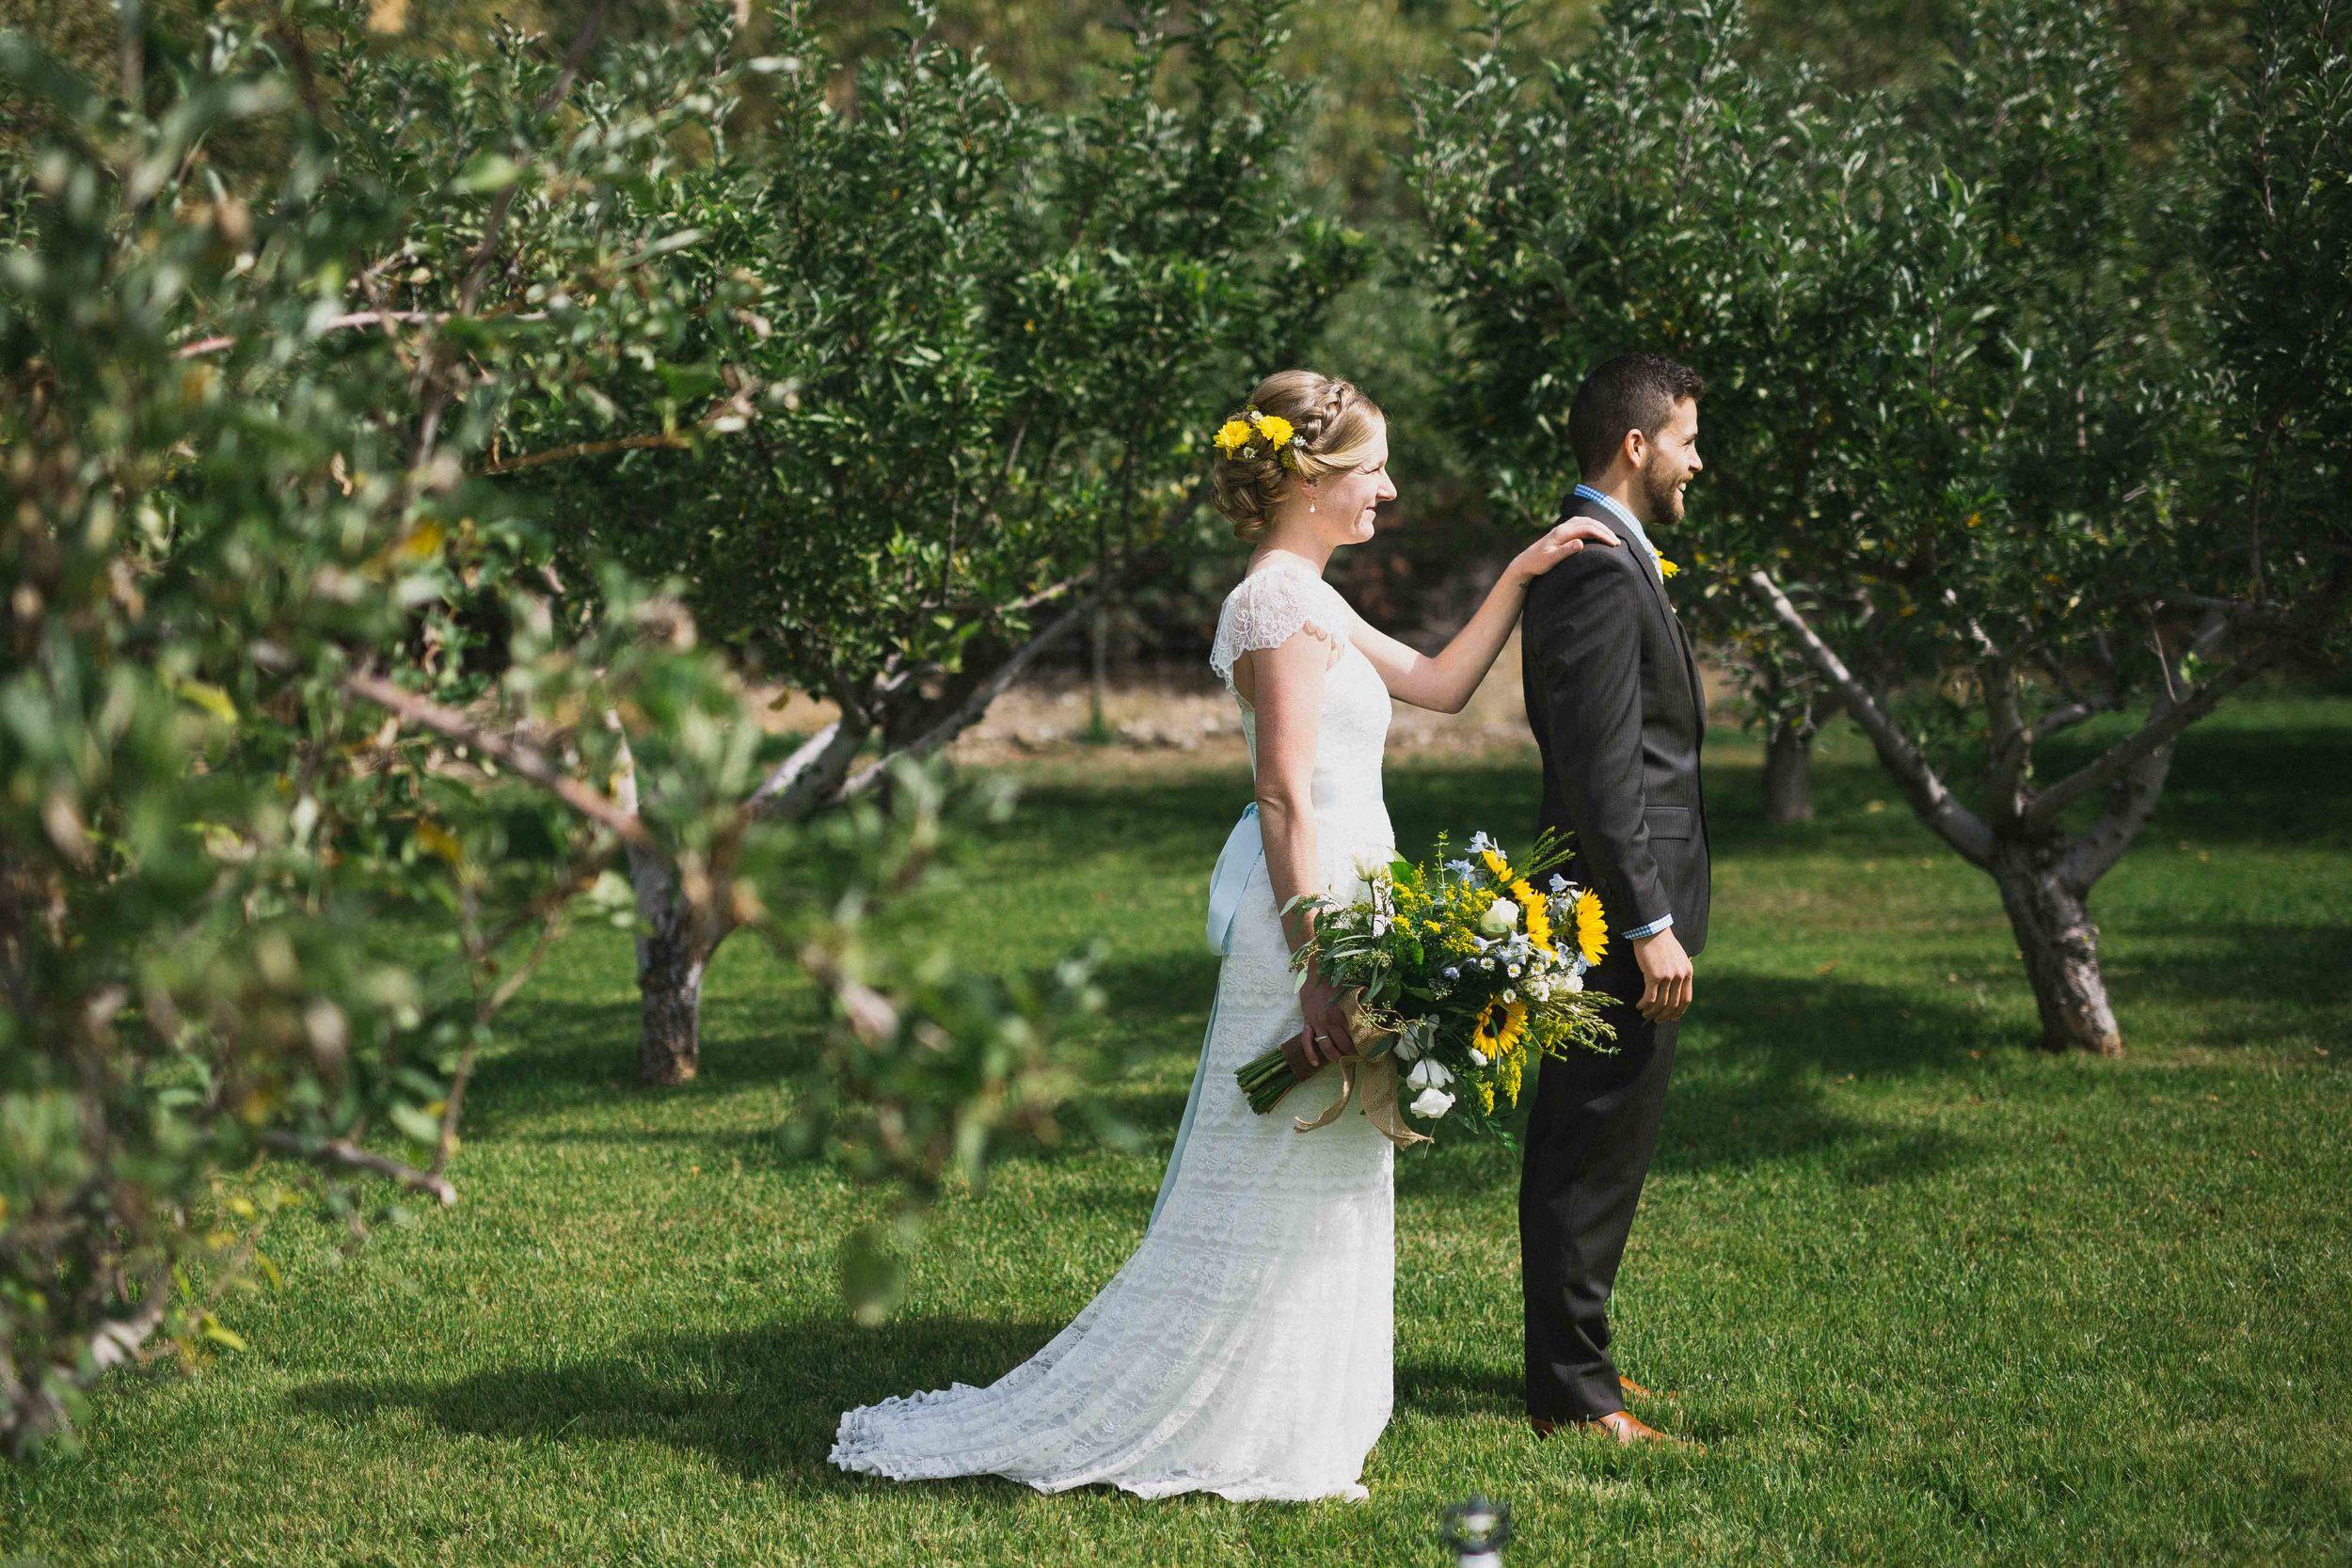 Salt-Lake-City-Utah-Wedding-Photographer-11.jpg